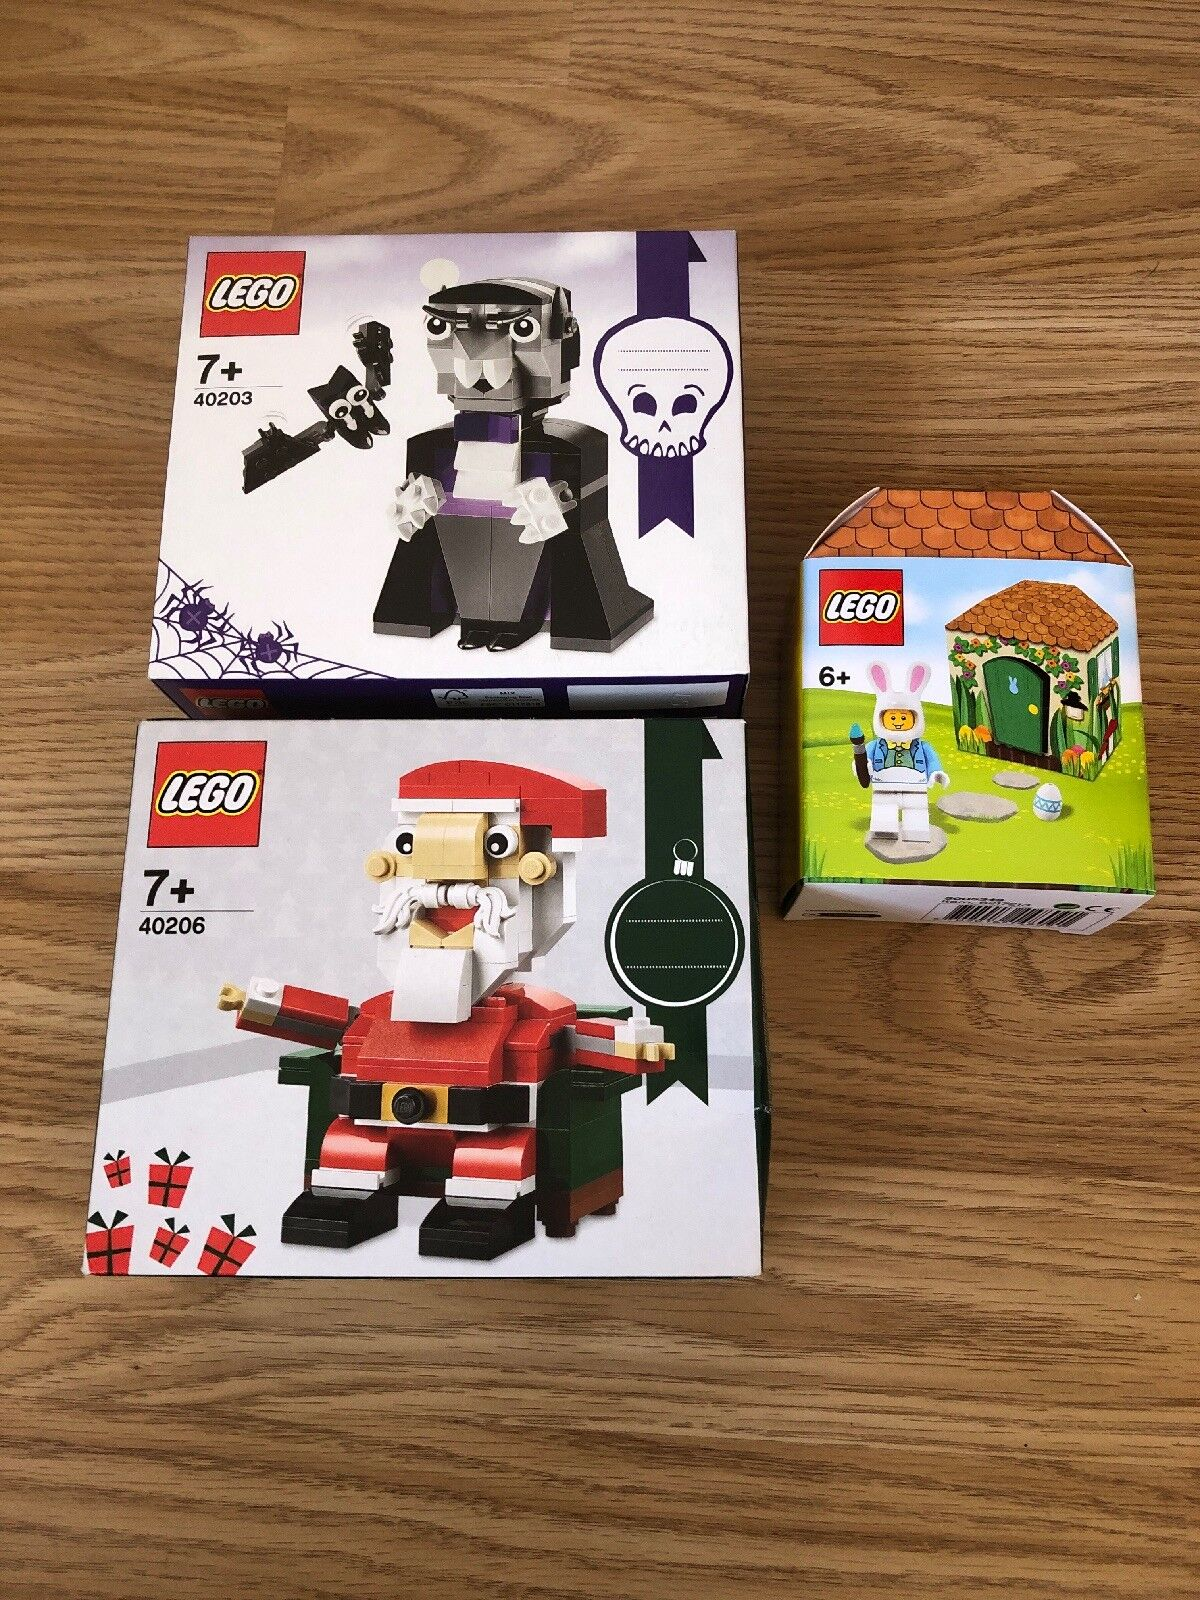 LEGO 40206 SANTA CHRISTMAS SET 40203 DRACULA AND EASTER SET - NEW SEALED 2016